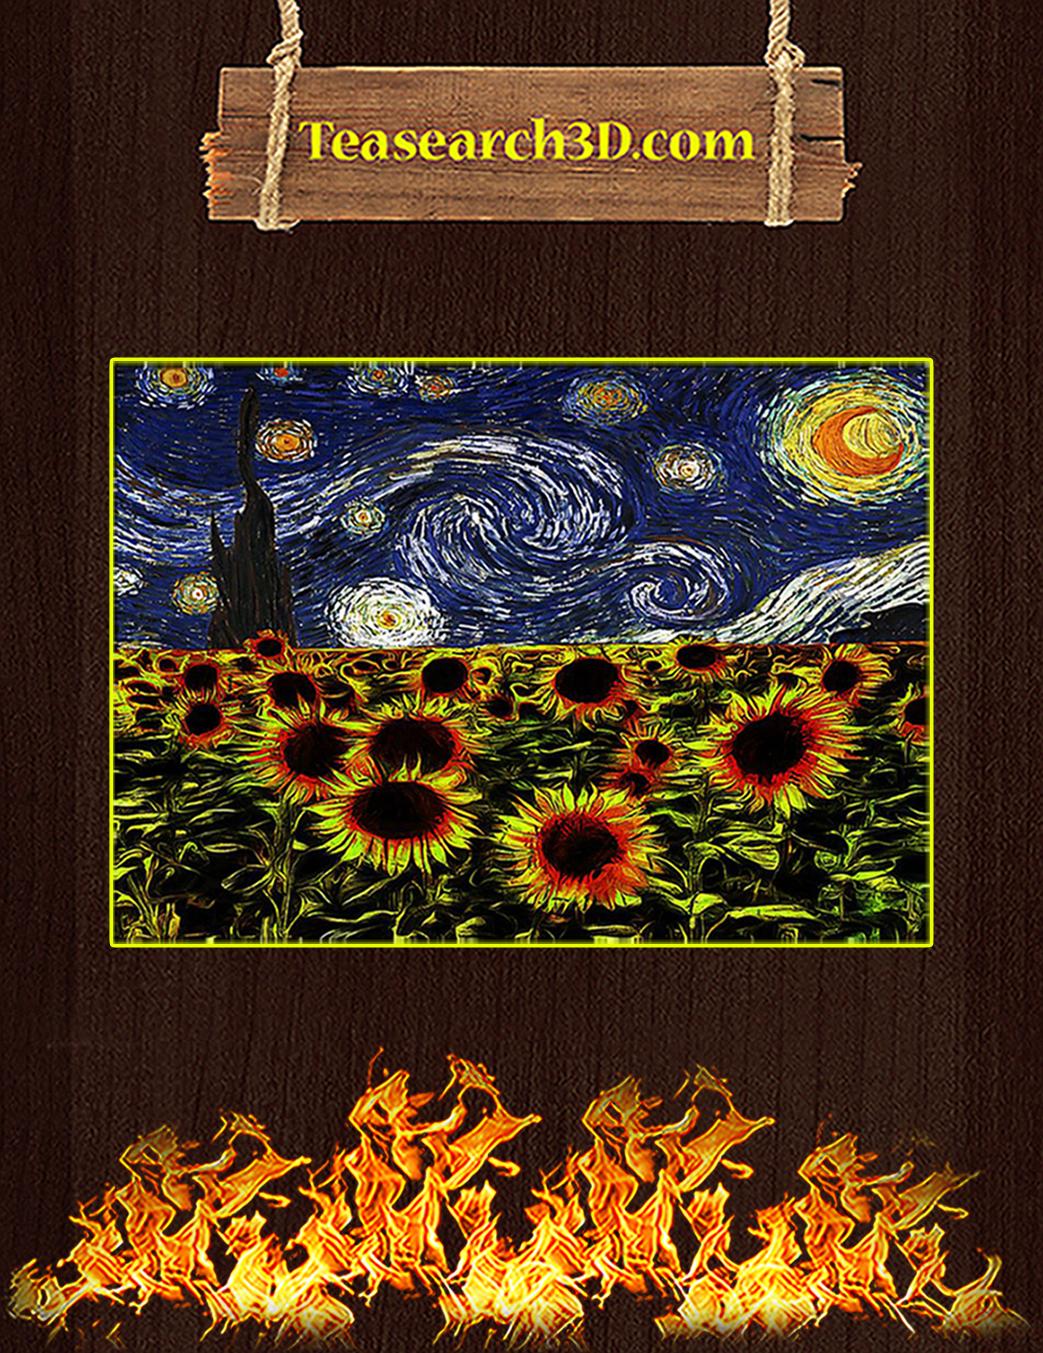 Sunflowers starry night van gogh poster A1